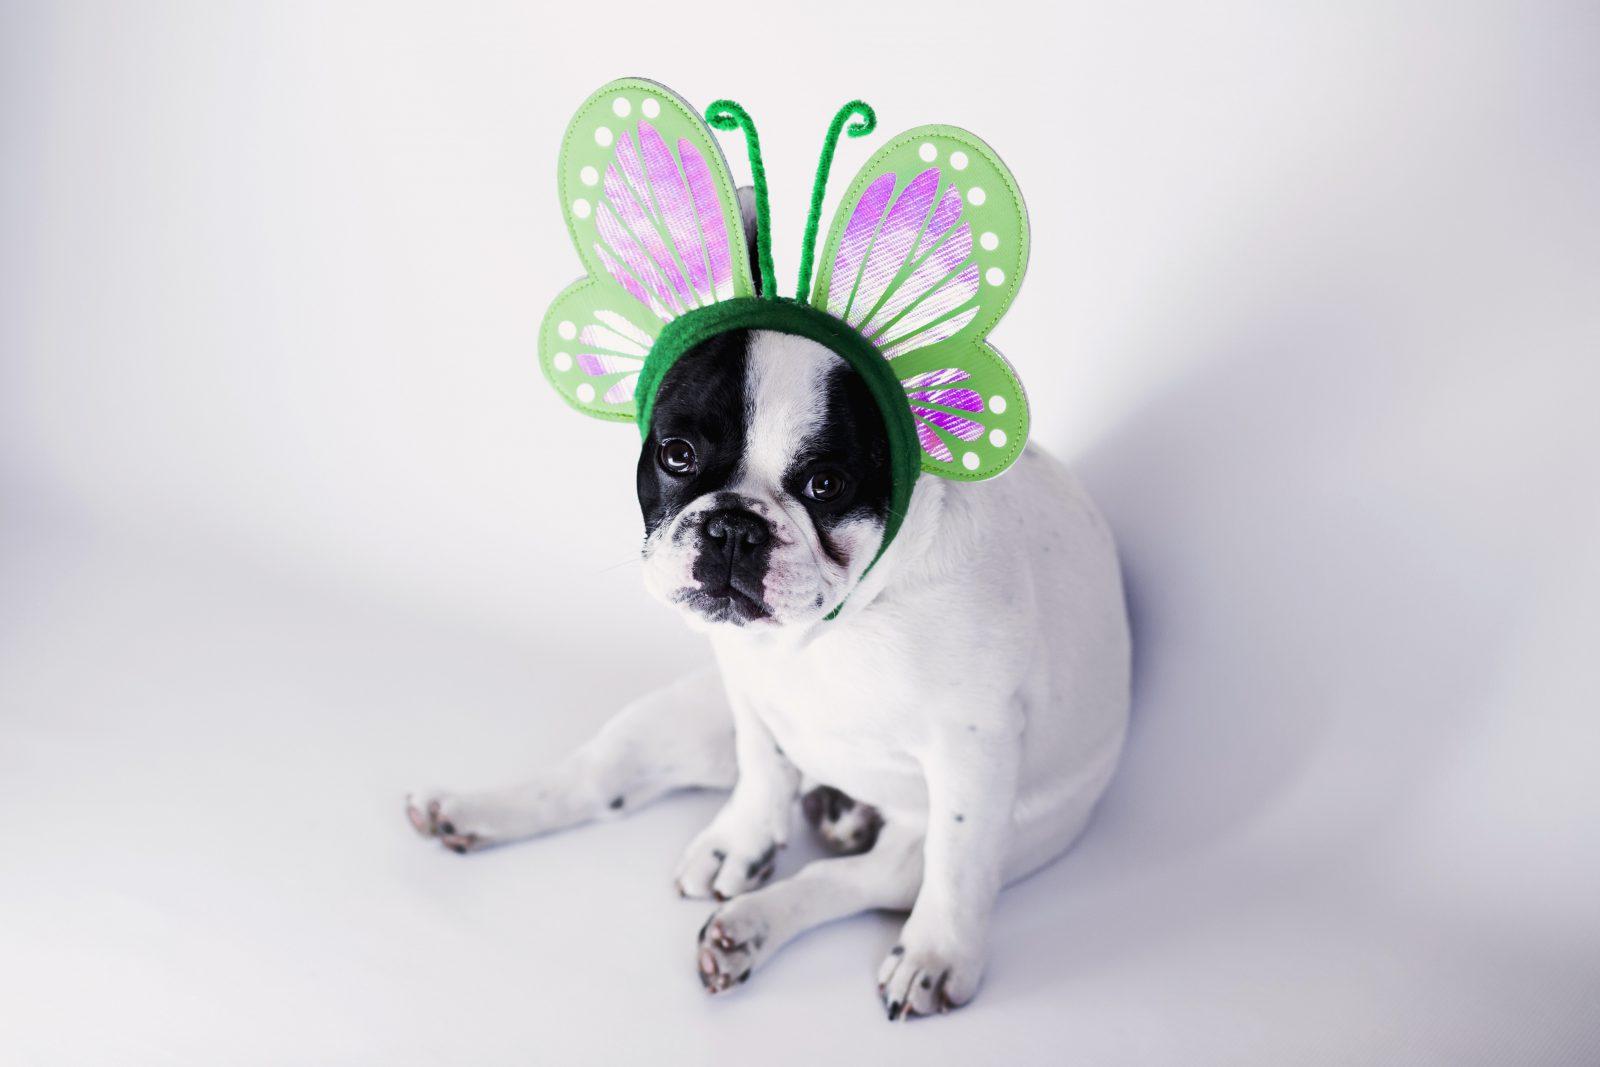 Acessórios para cachorros: Boston terrier com tiara de borboleta - fantasia linda de carnaval.